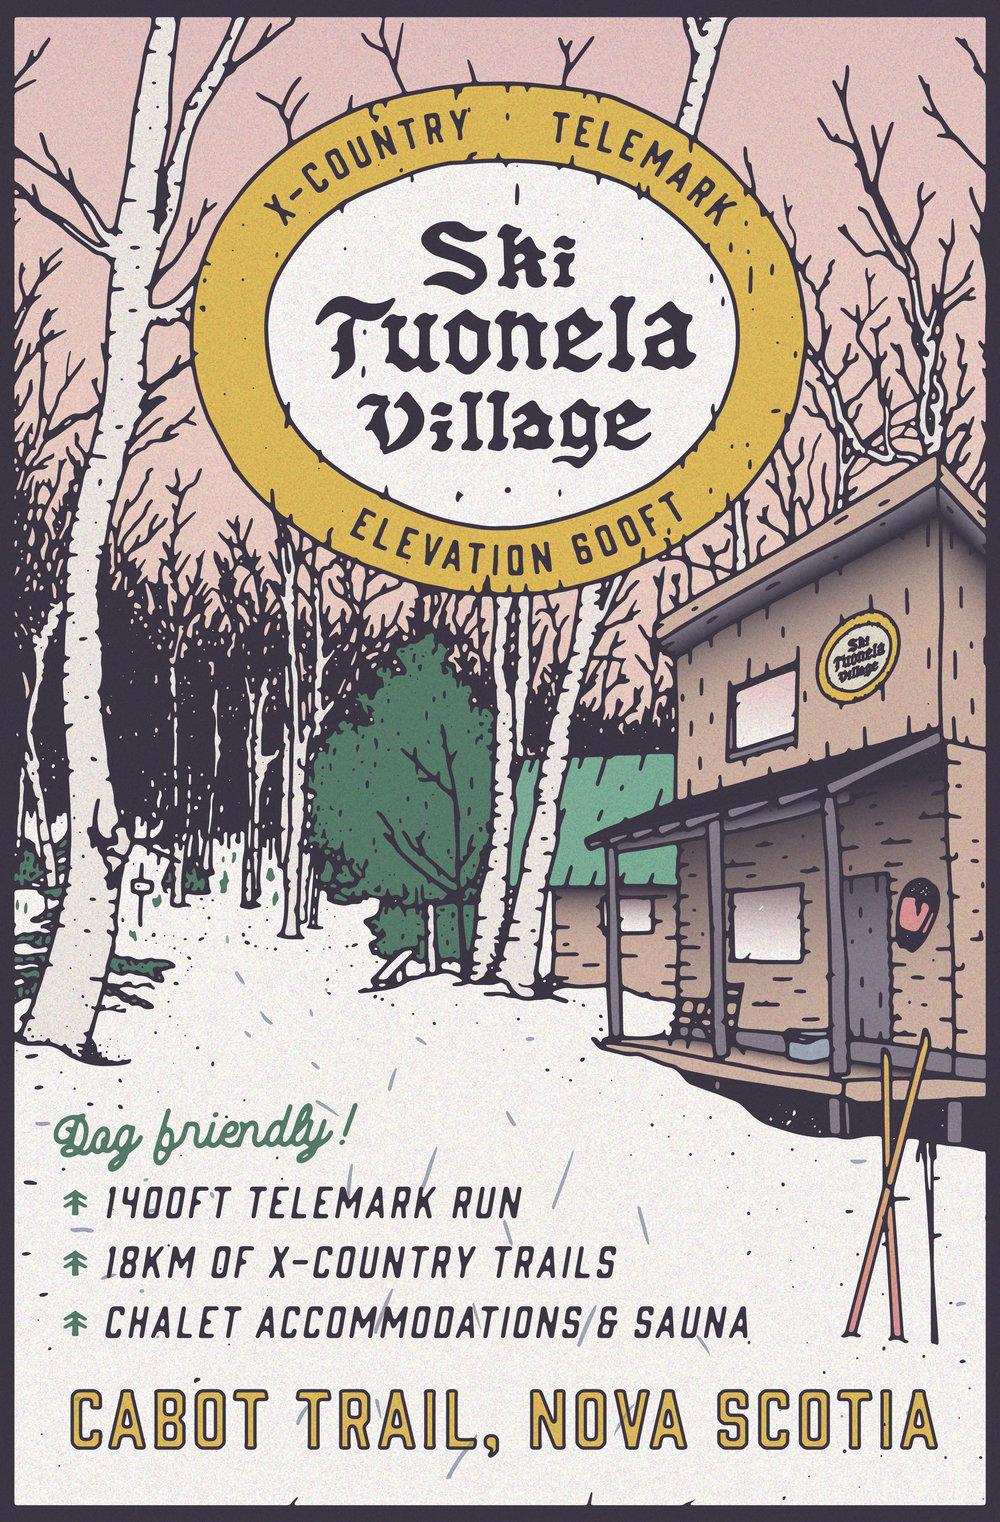 Awesome wilderness resort:   Ski Tuonela